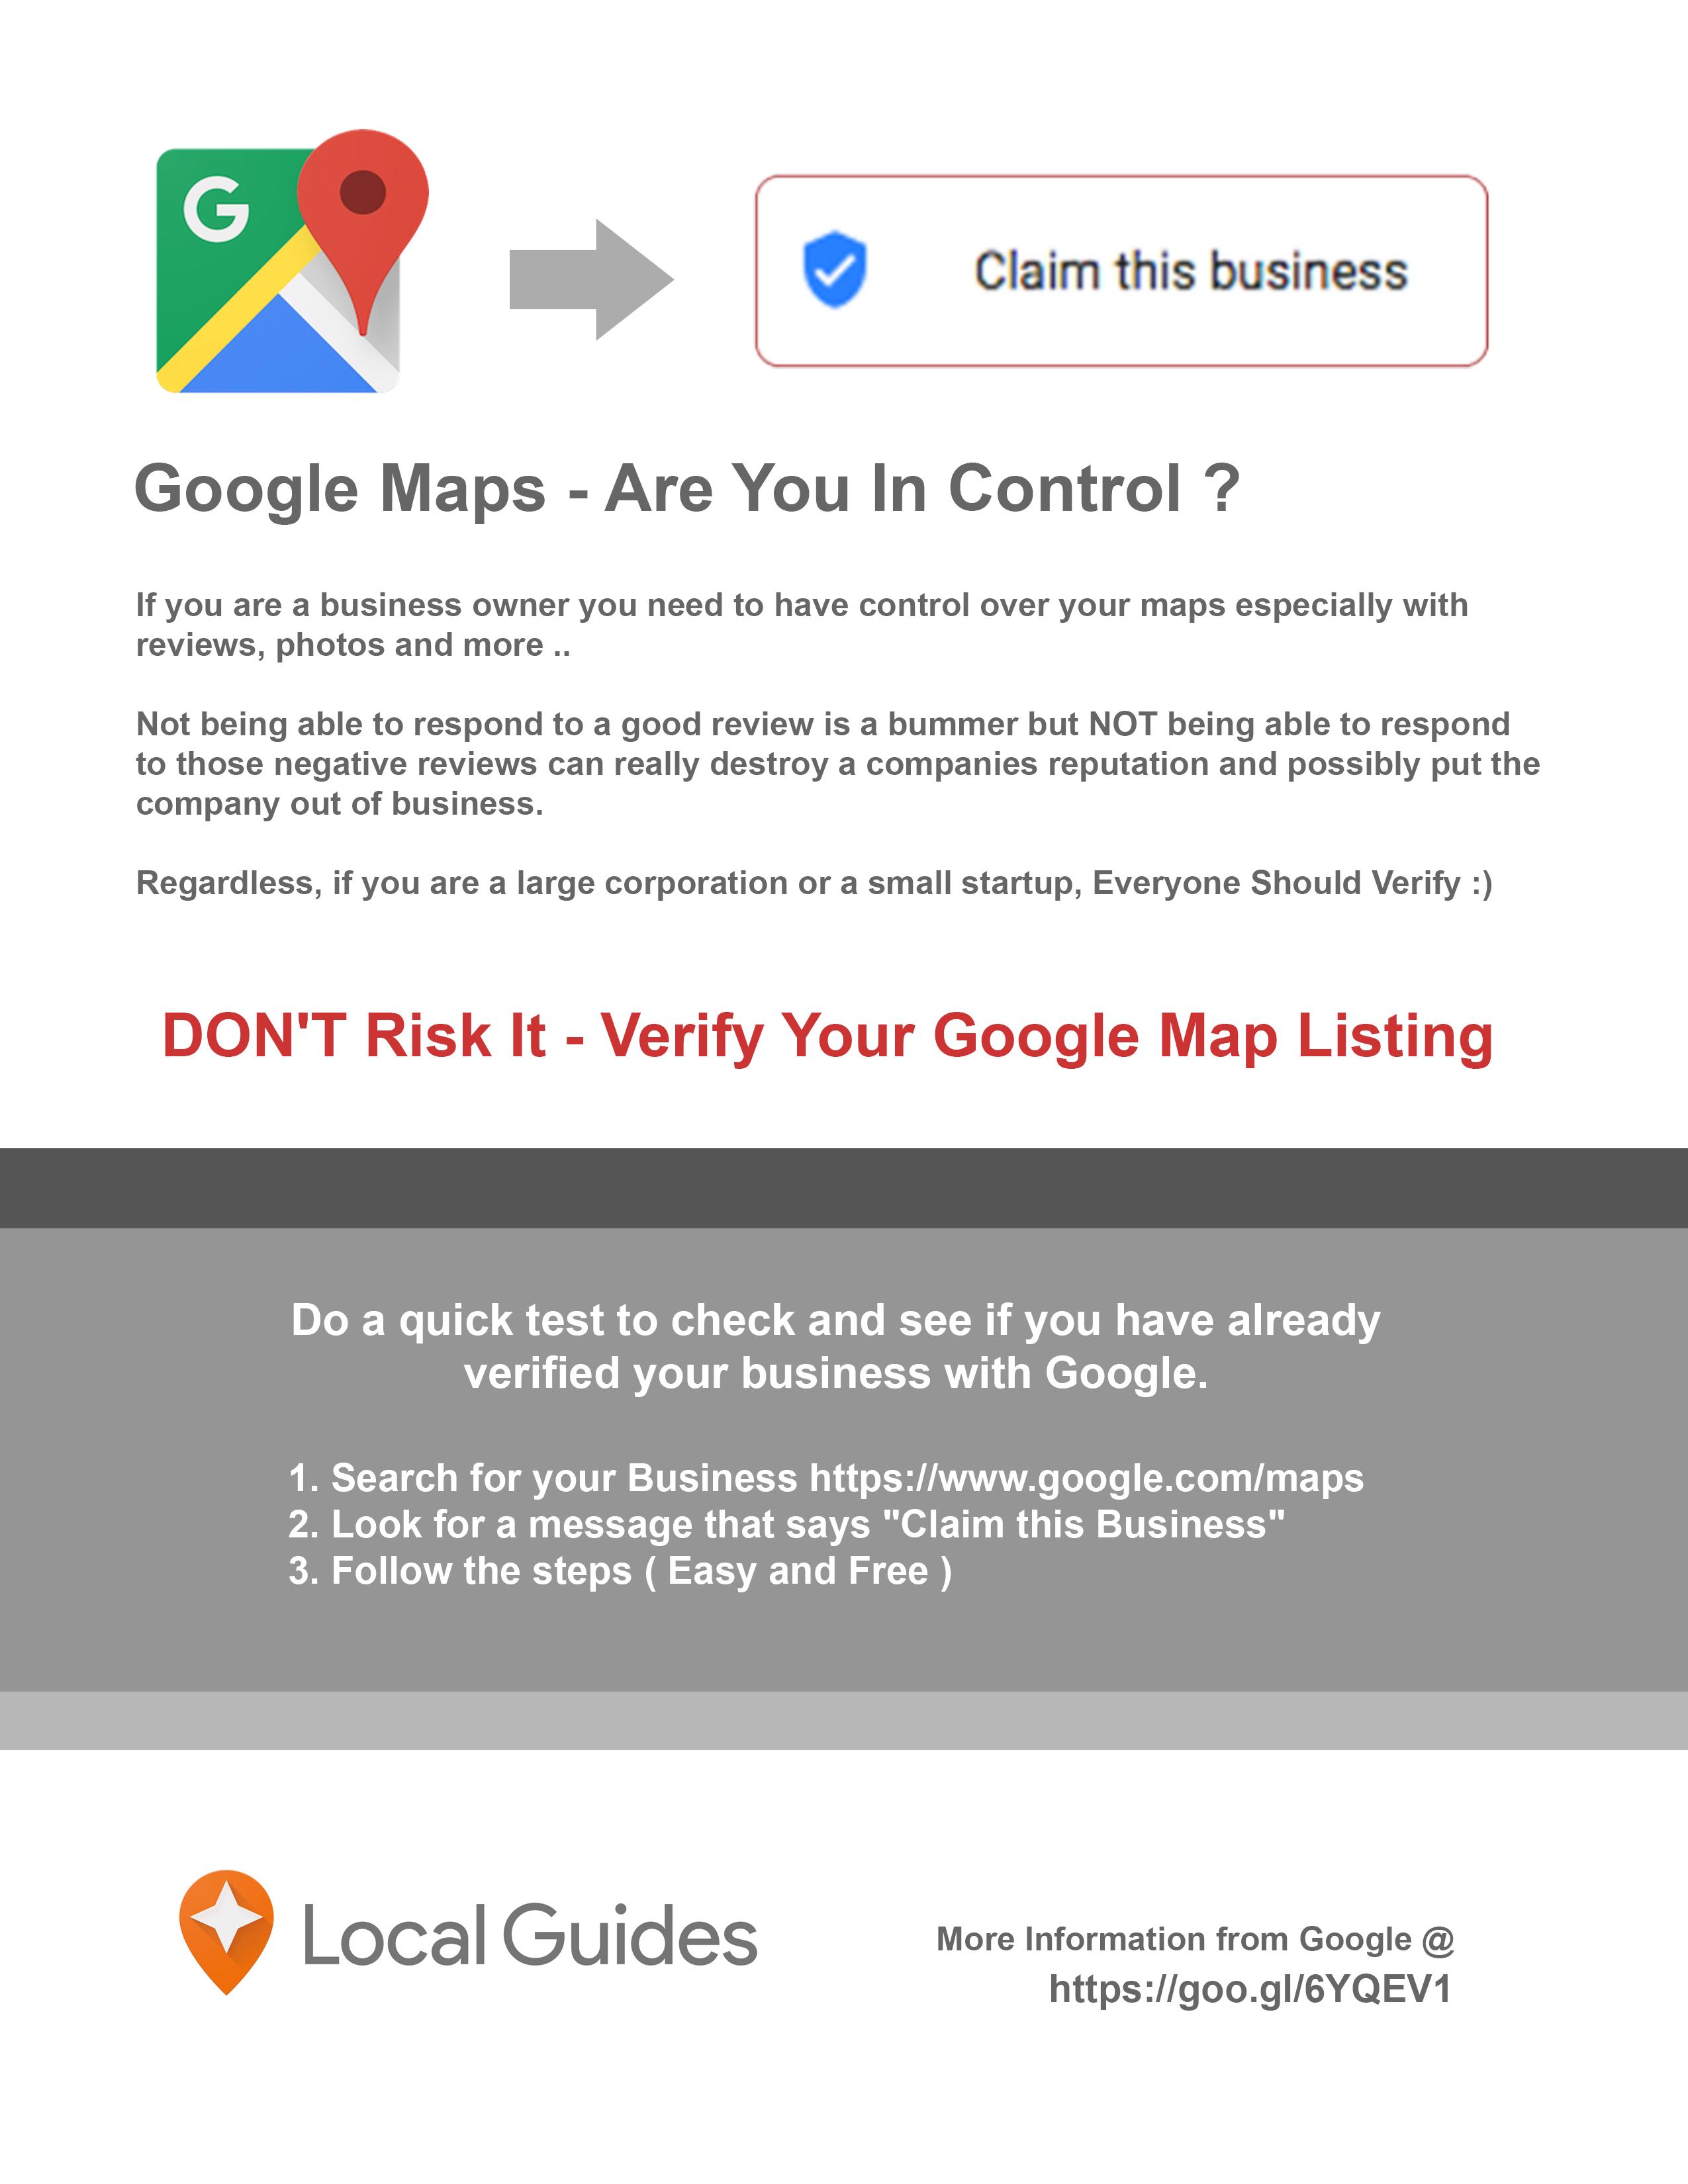 Does Google follow you